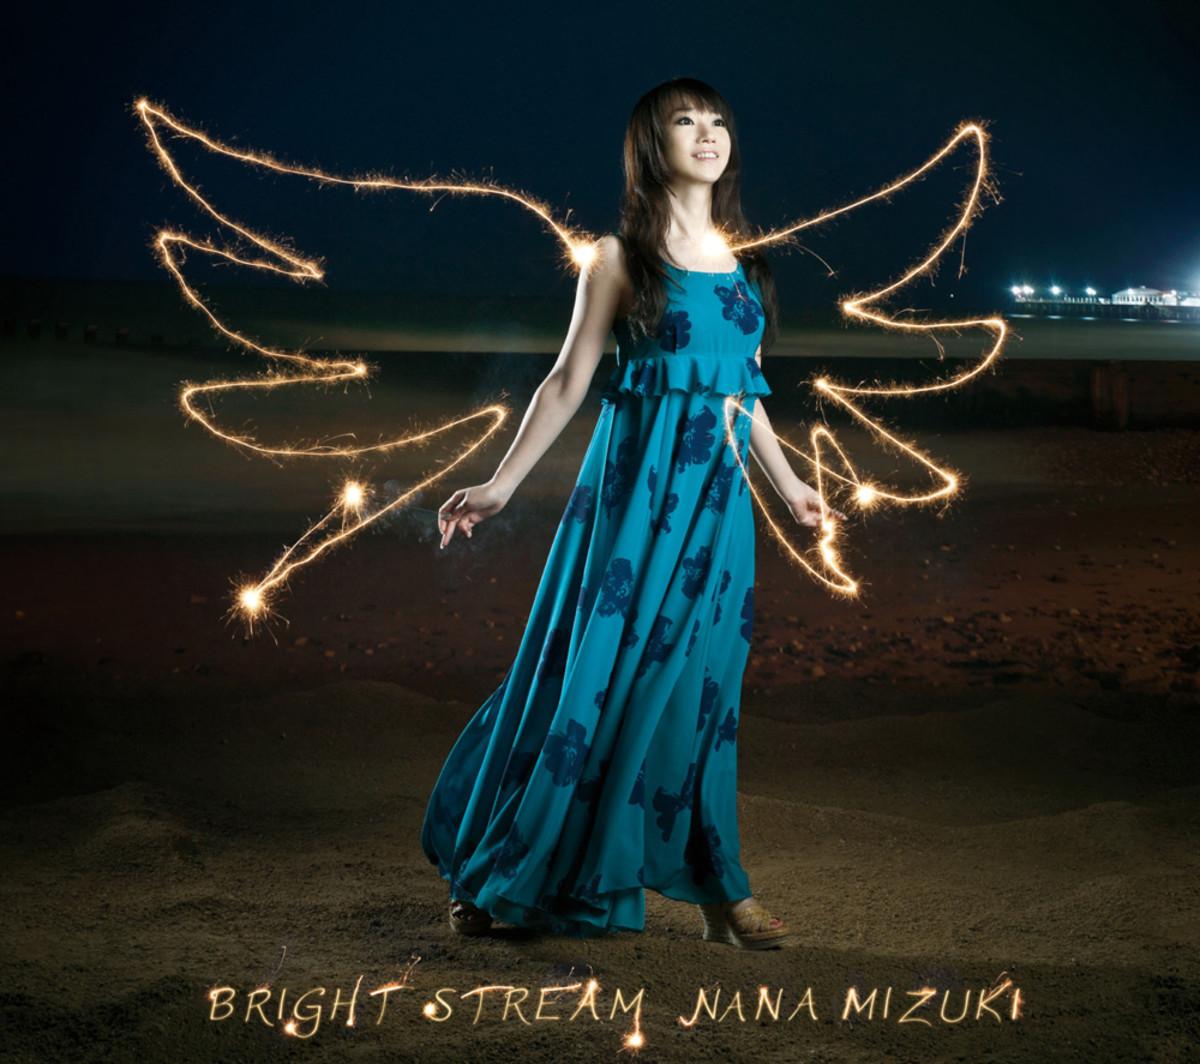 SMAP (スマップ) 28thシングル『BRIGHT STREAM (ブライト・ストリーム)』高画質ジャケット画像